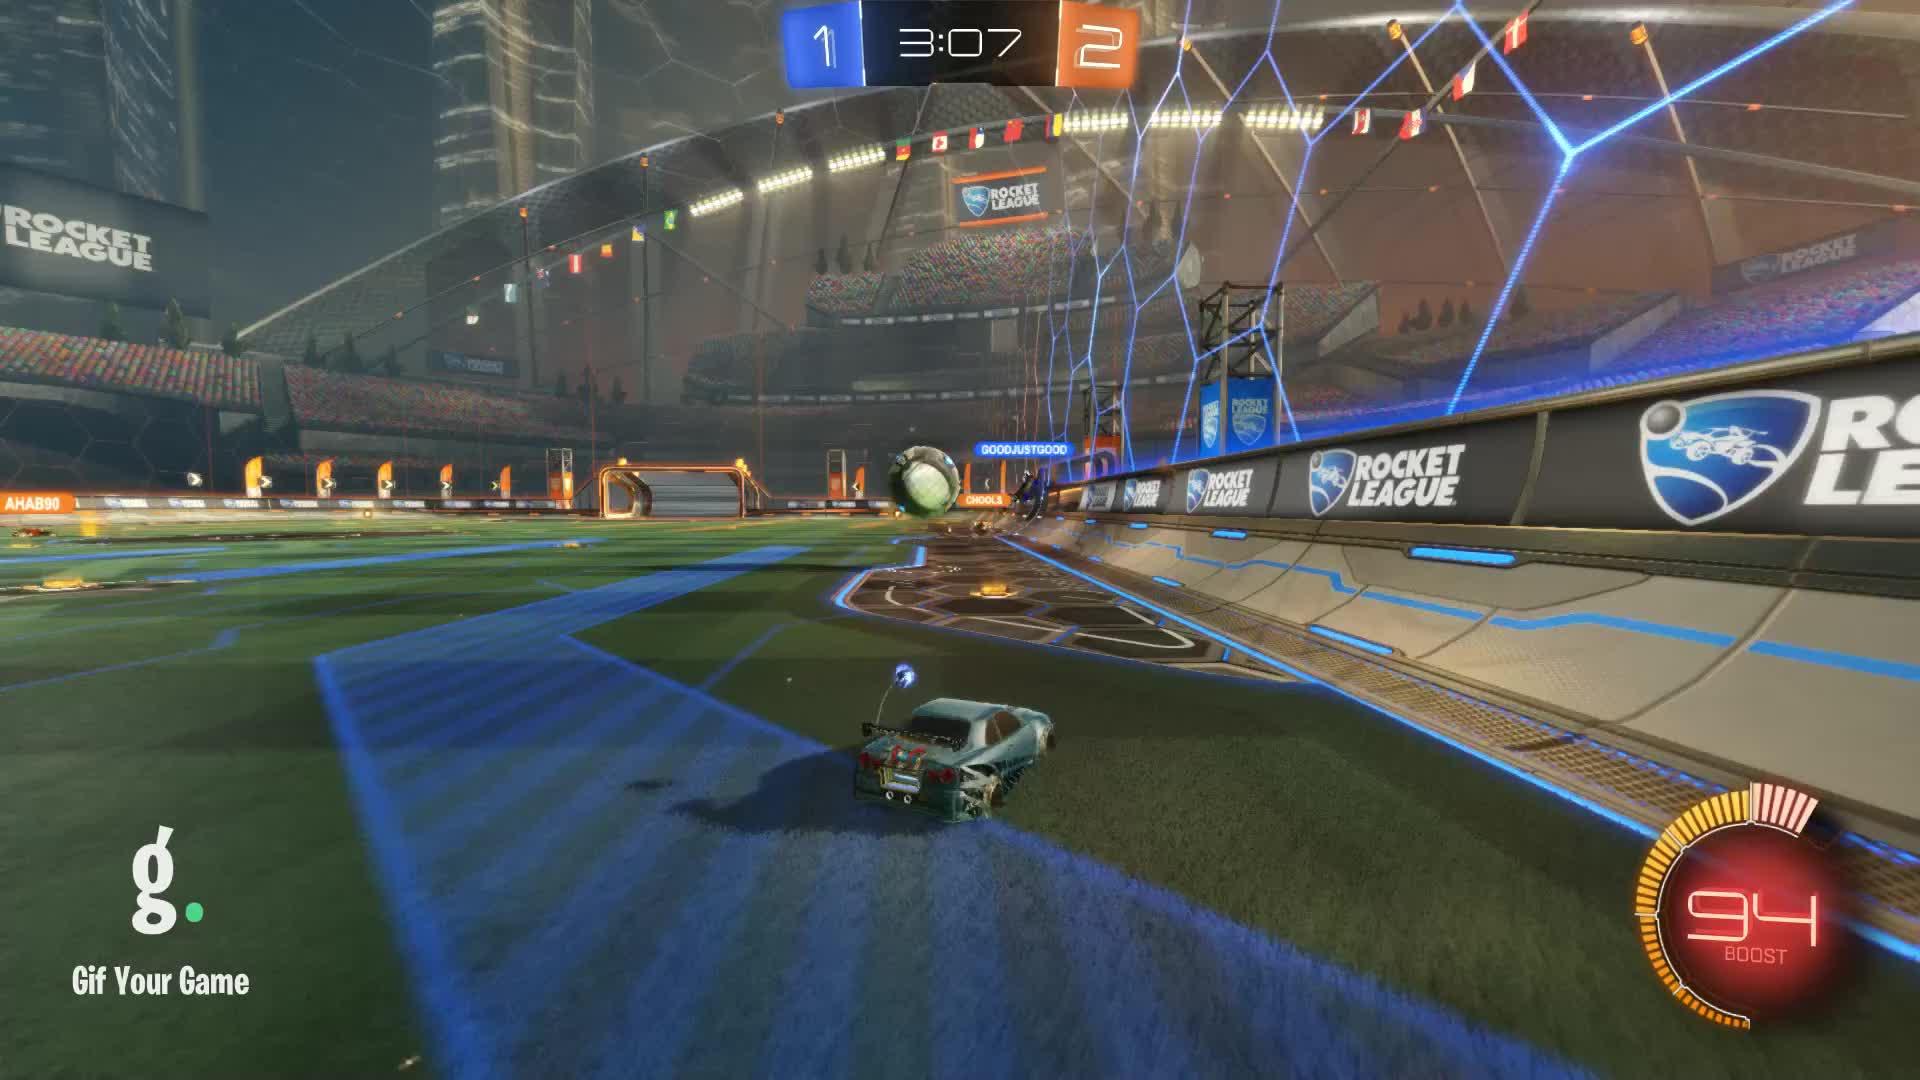 Gif Your Game, GifYourGame, Goal, LordTempestX, Rocket League, RocketLeague, Goal 4: LordTempestX GIFs